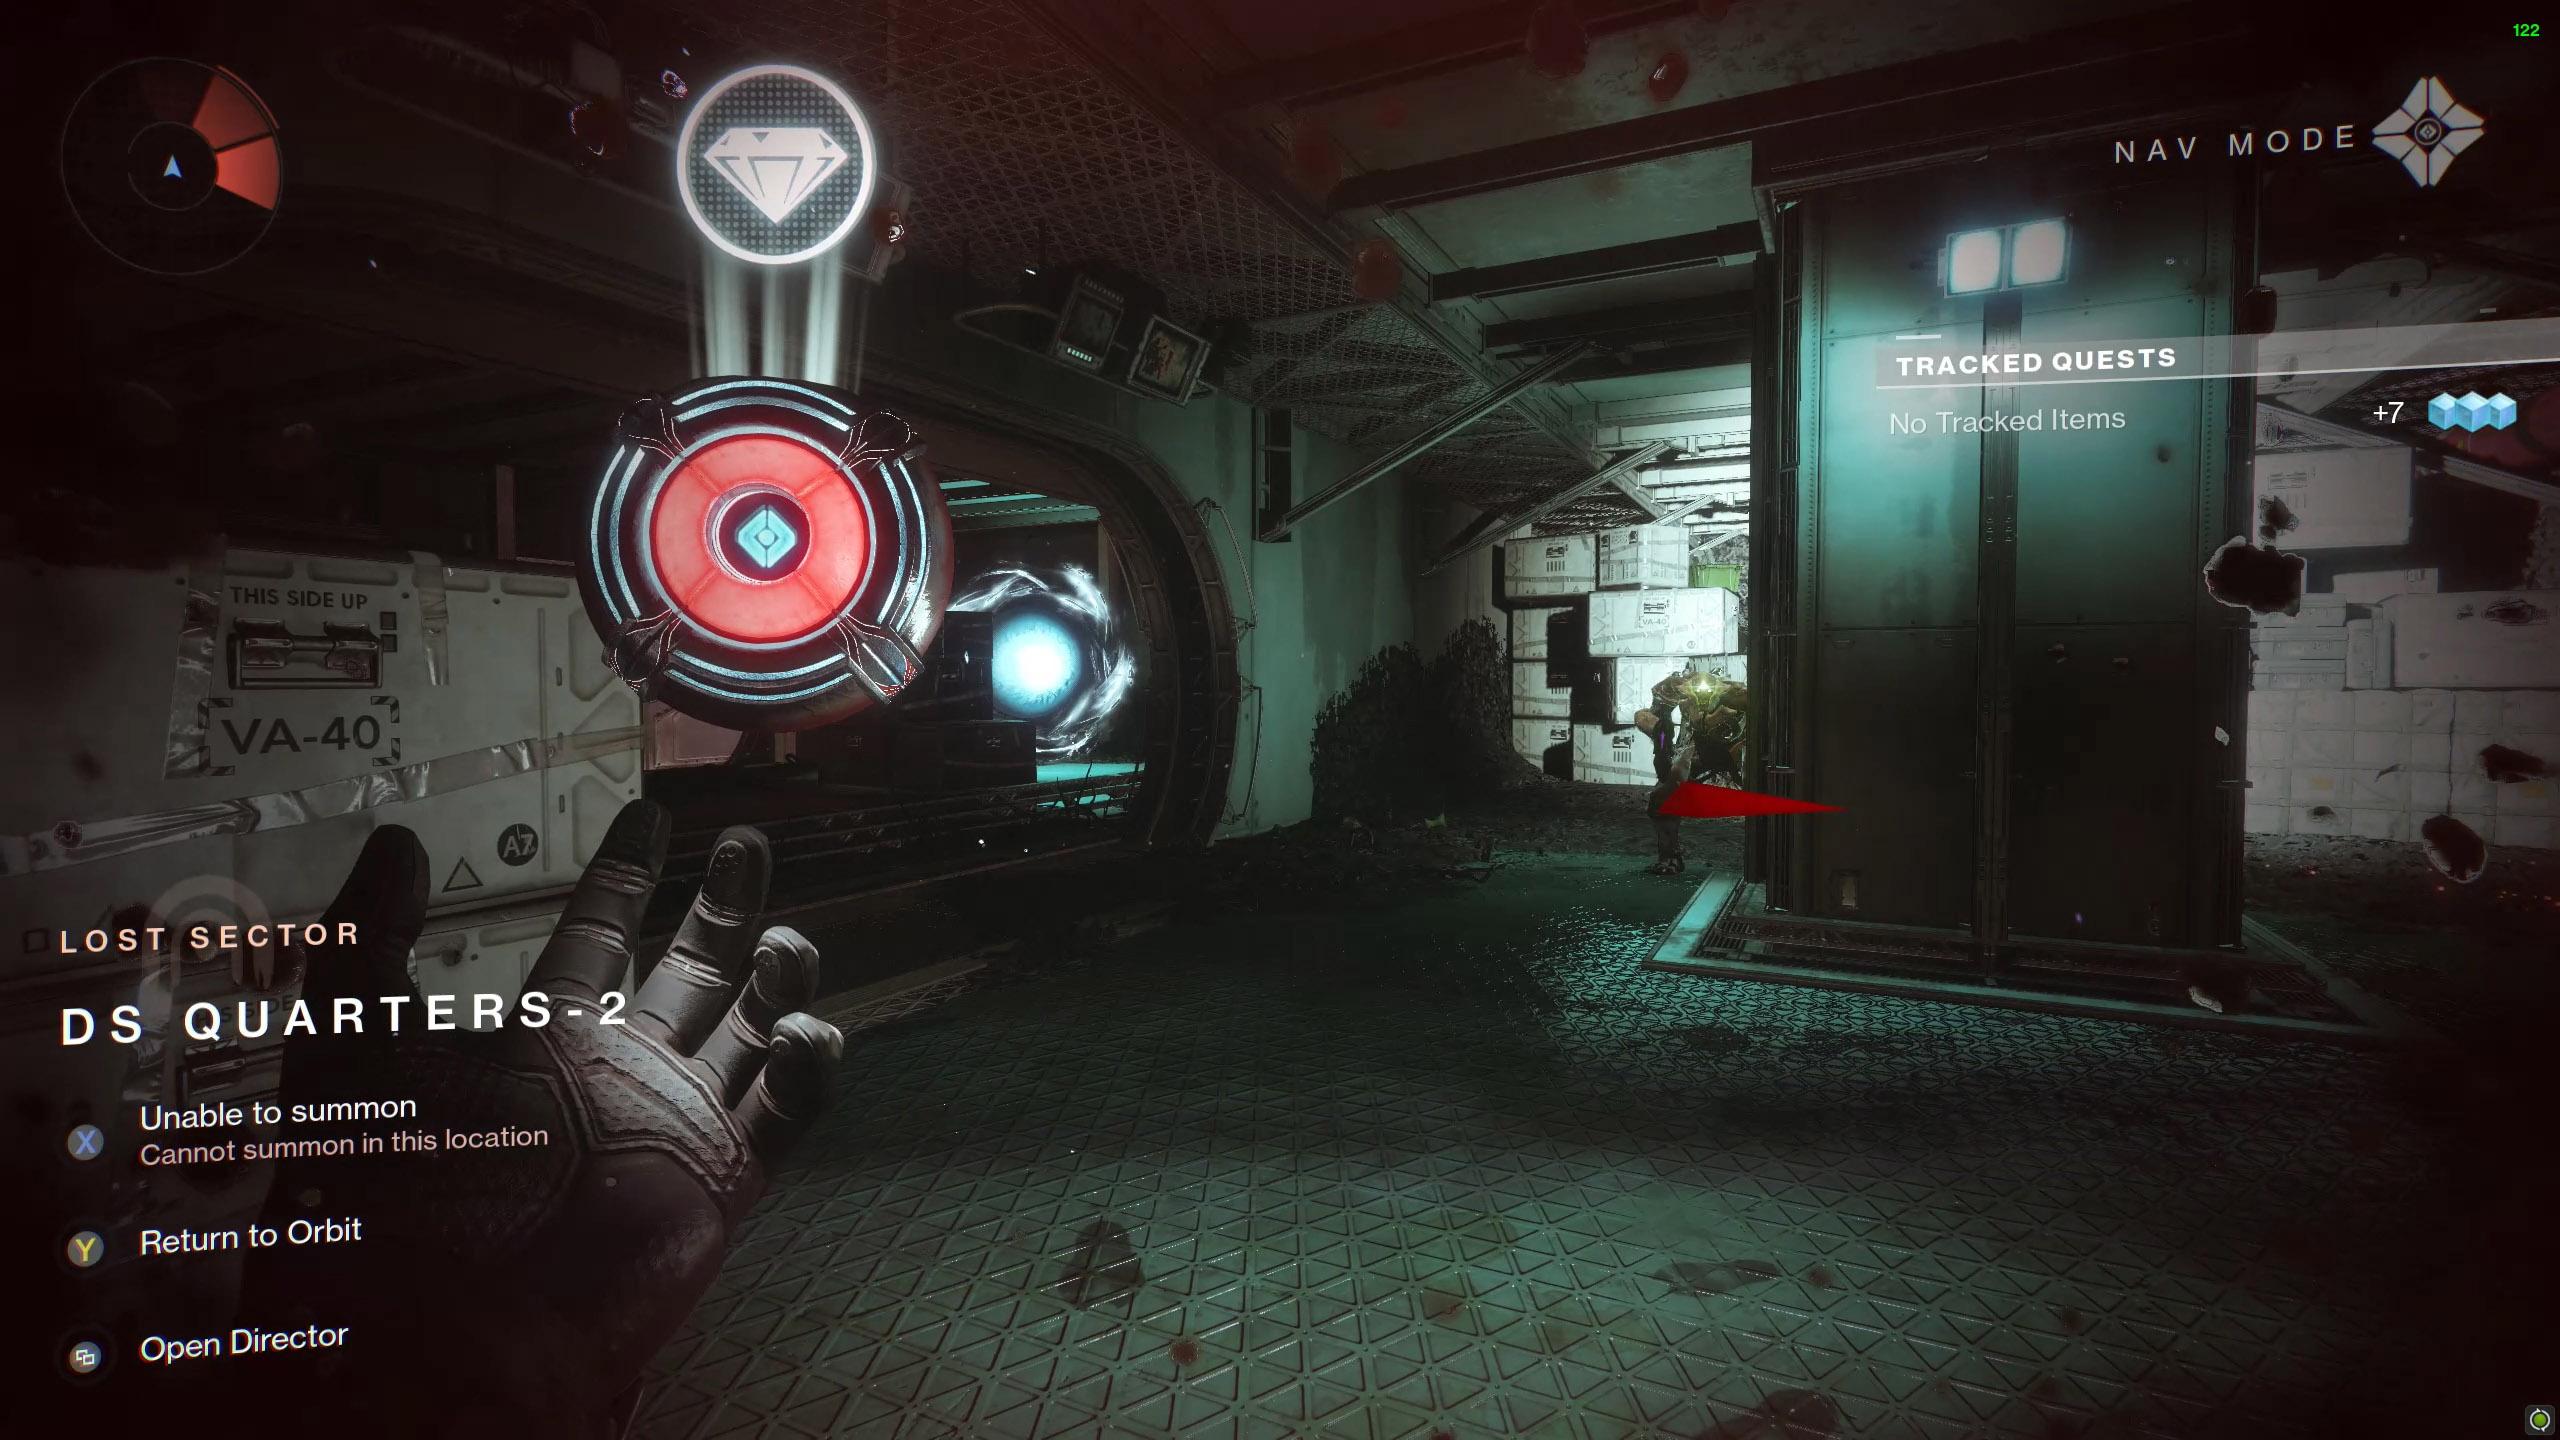 Destiny 2 Savanthuns Eyes Titan DS Quarters-2